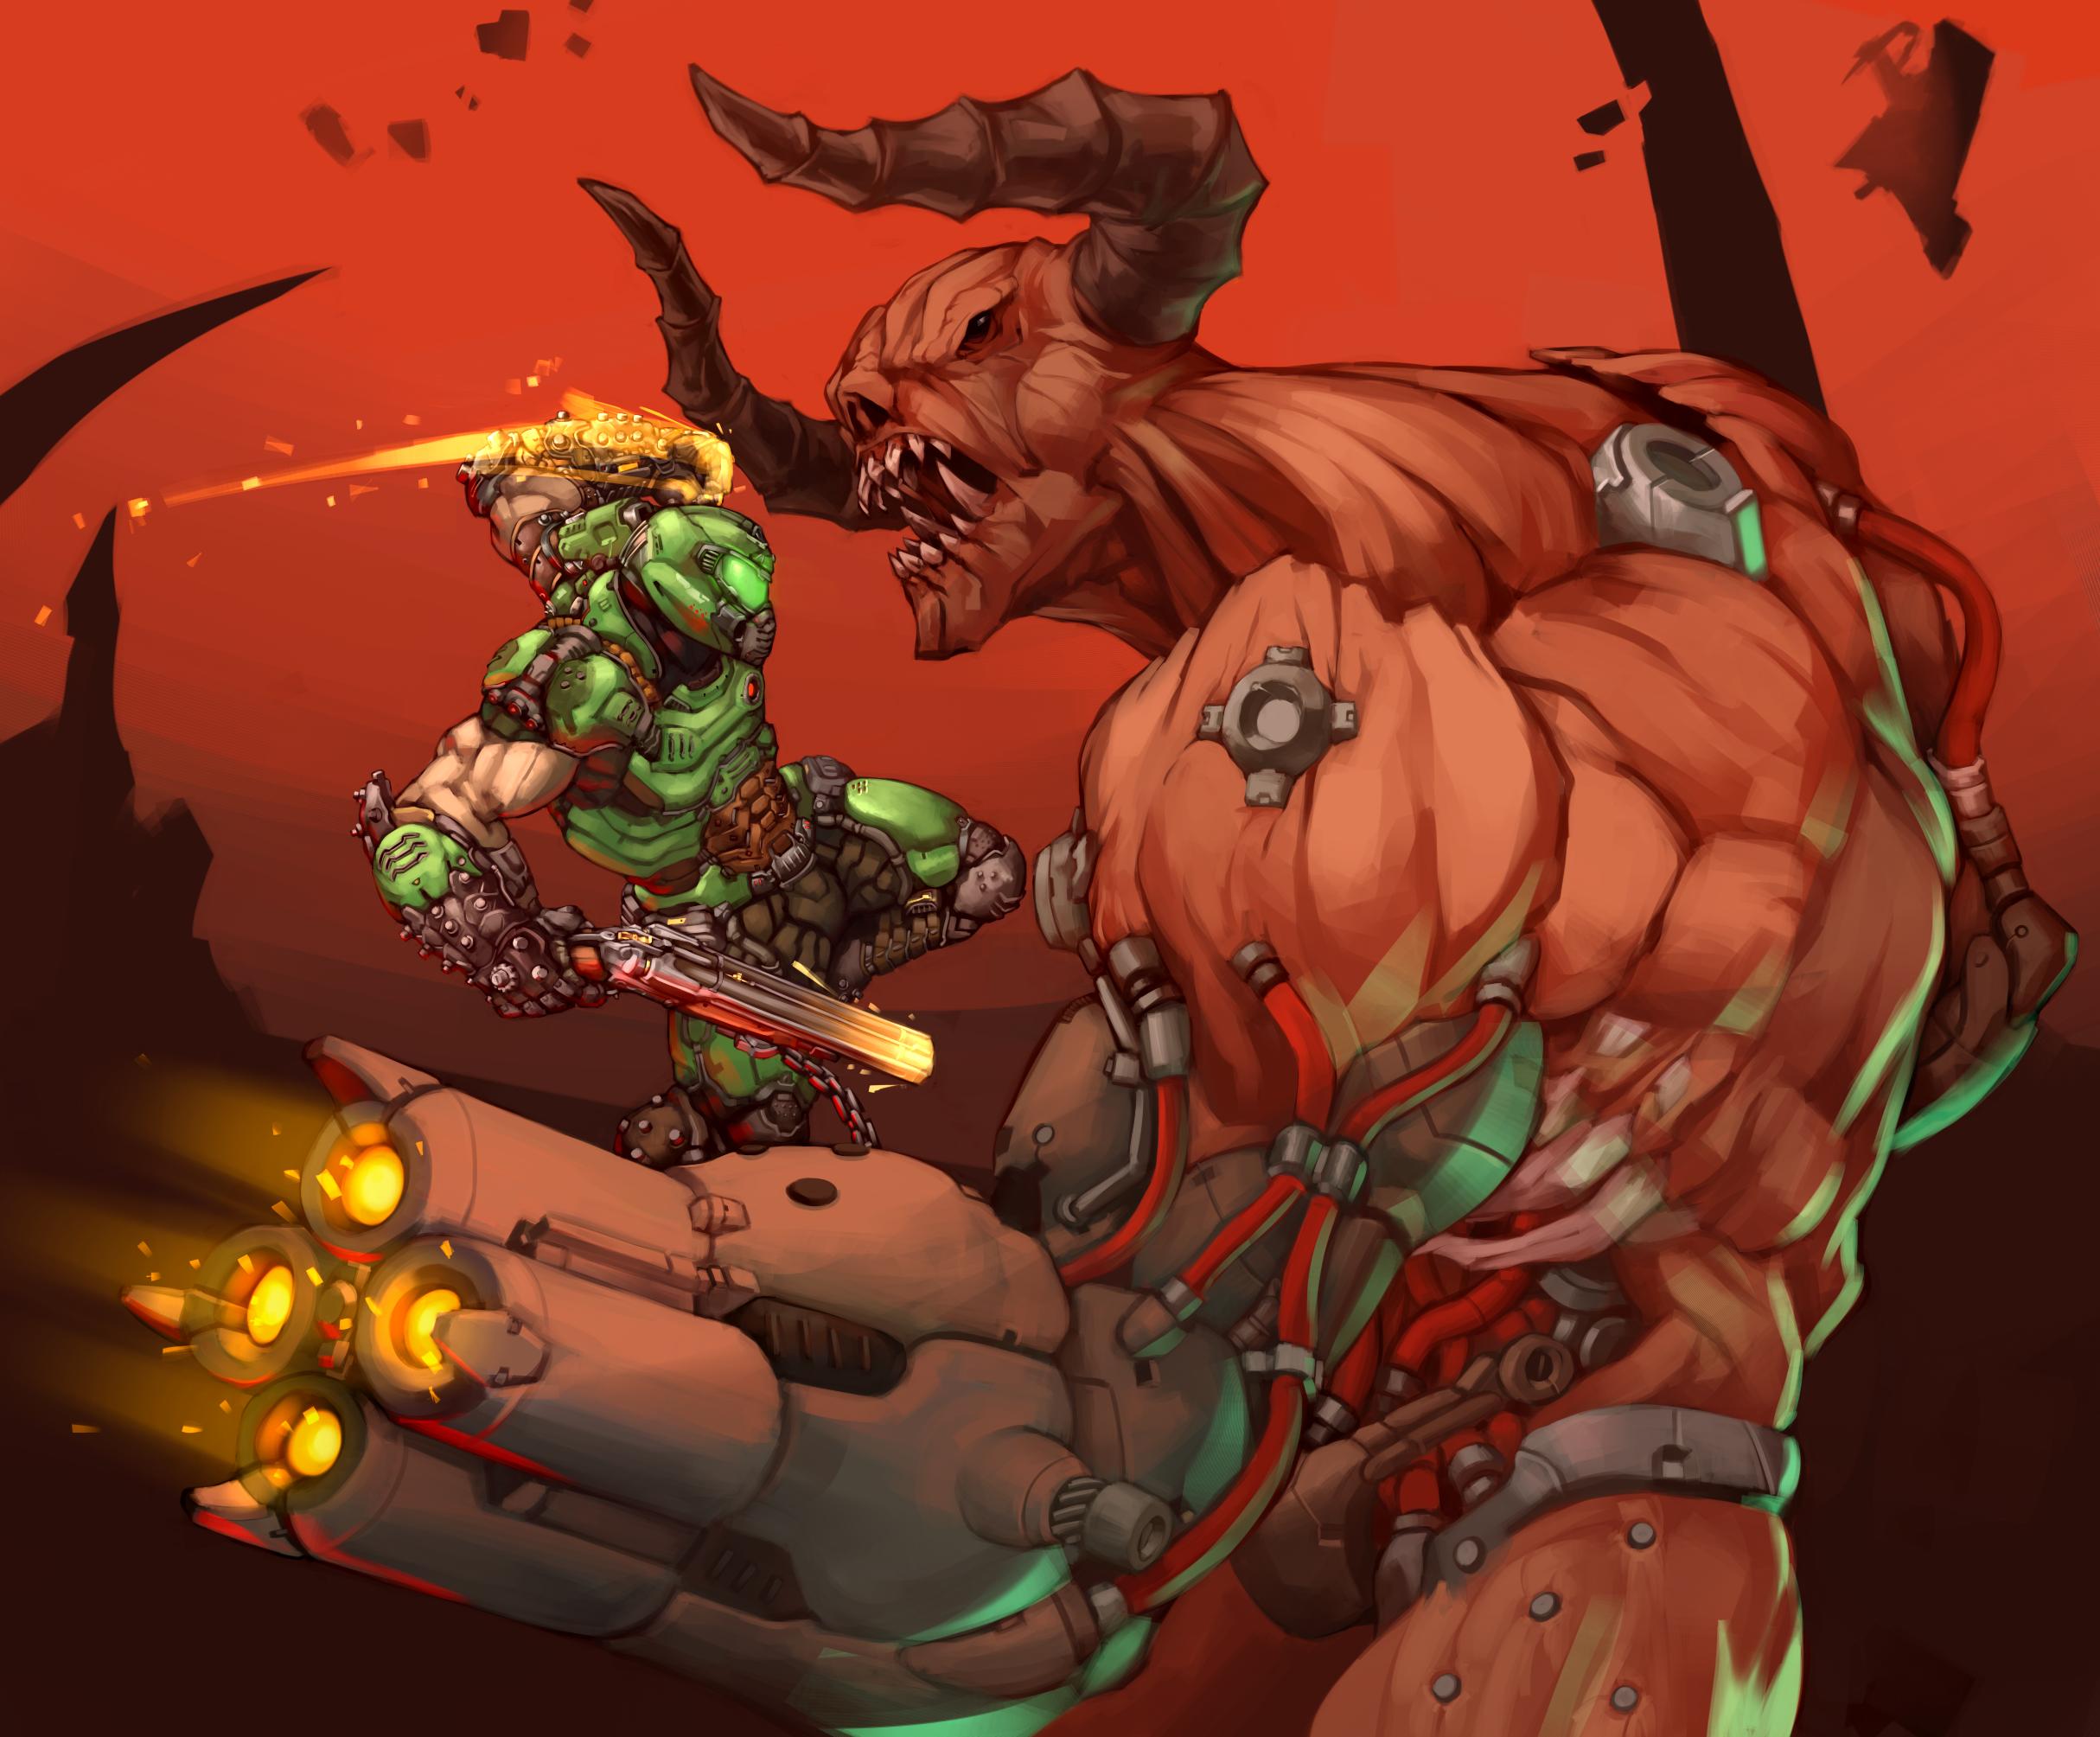 Doom Slayer Vs Cyberdemon By Kelvinhiu On Deviantart